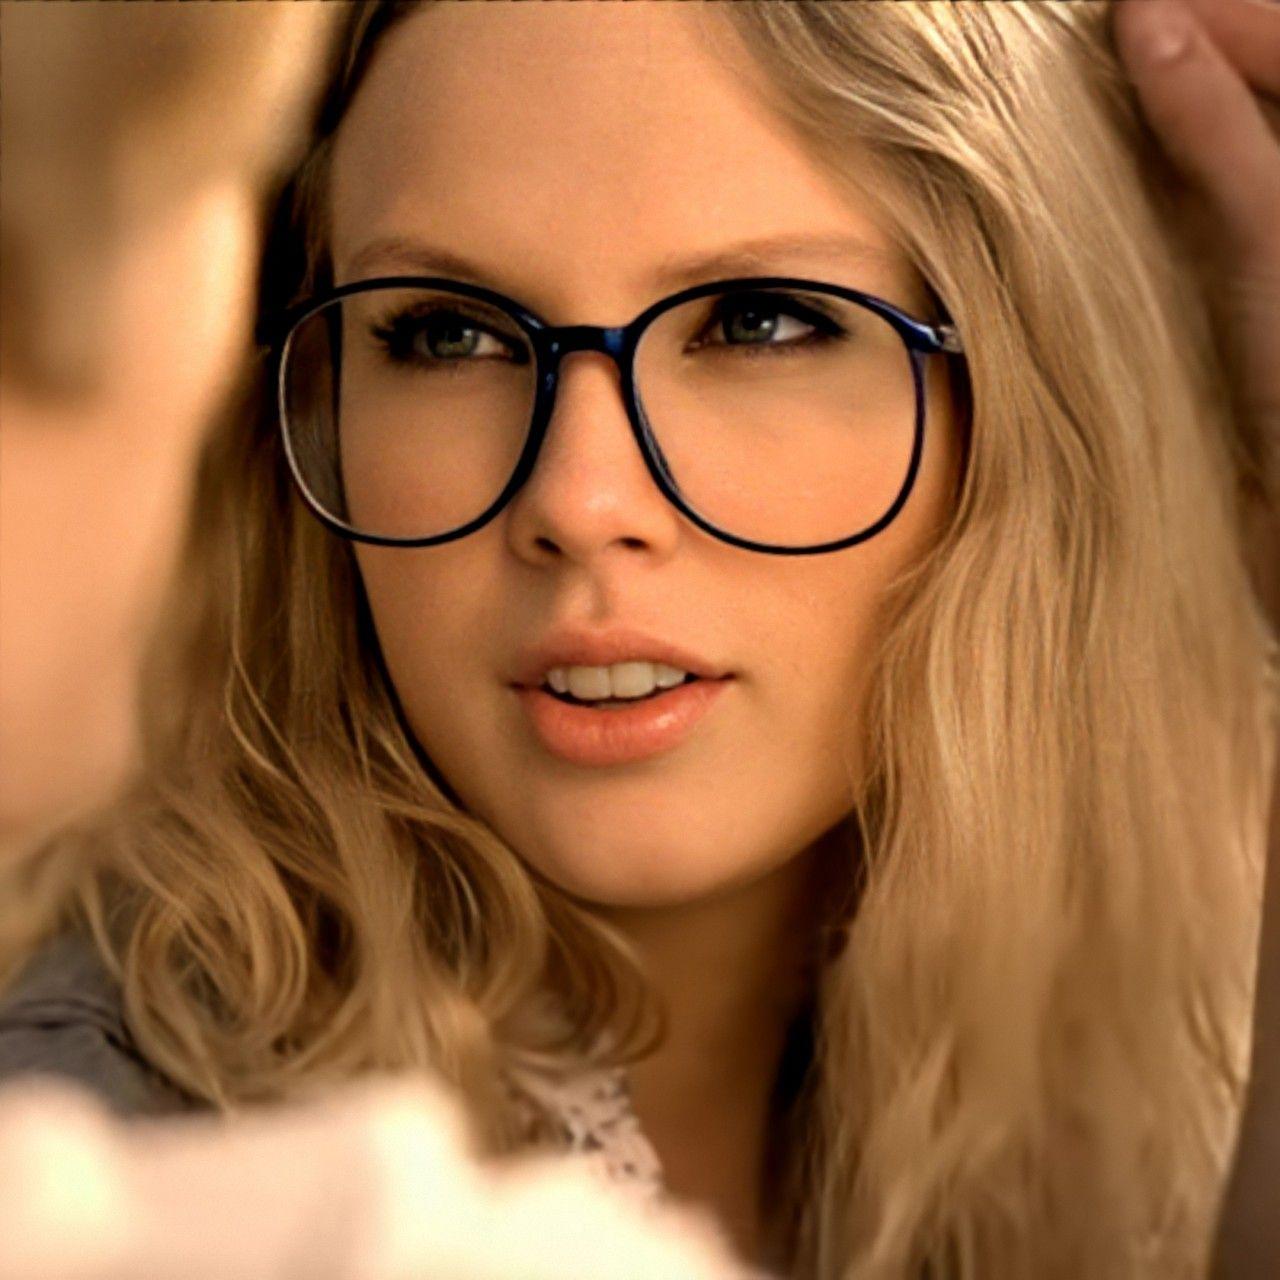 E N C H A N T E D Icon You Belong With Me Icons Please Like Or Reblog In 2020 Taylor Swift Music Videos Taylor Swift Music You Belong With Me